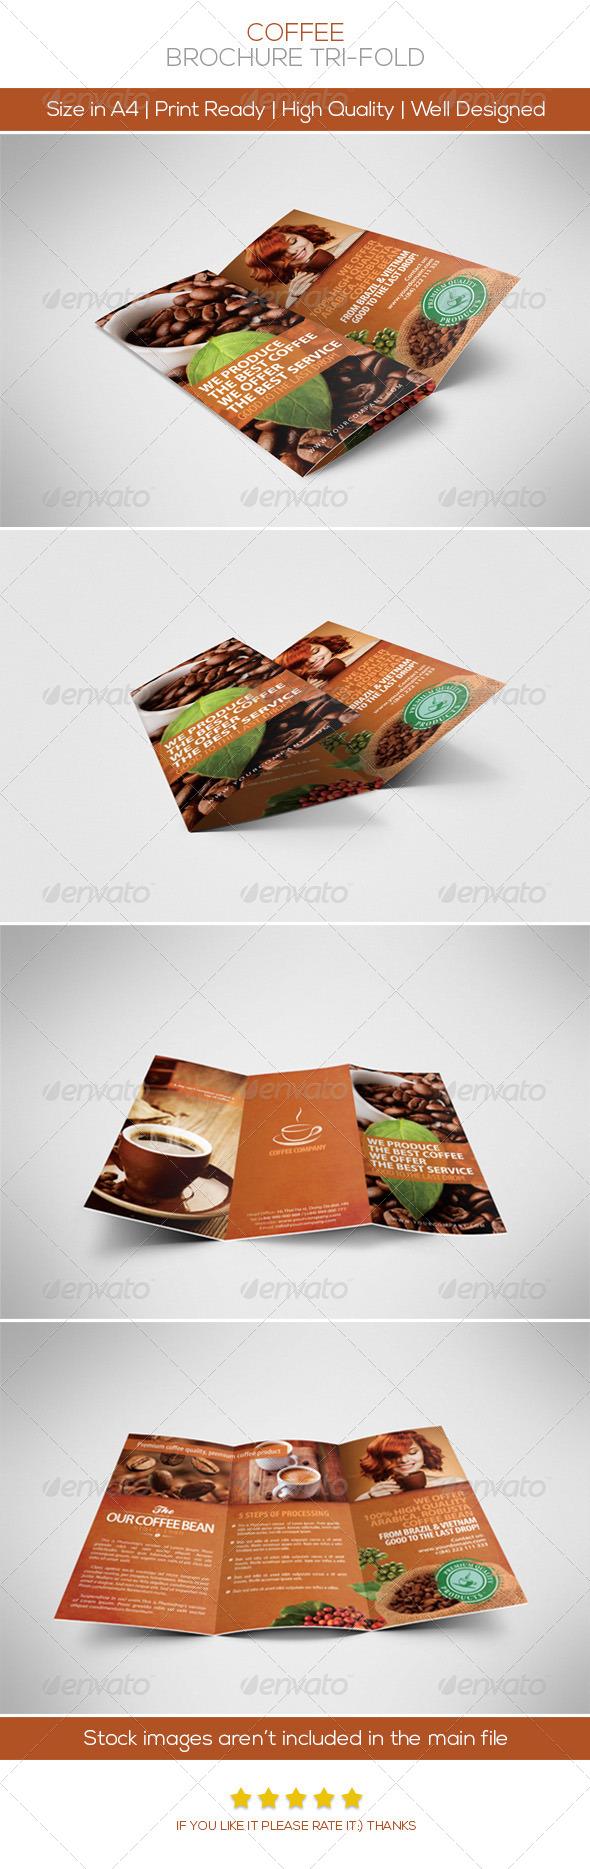 Coffee Brochure Tri-fold - Brochures Print Templates